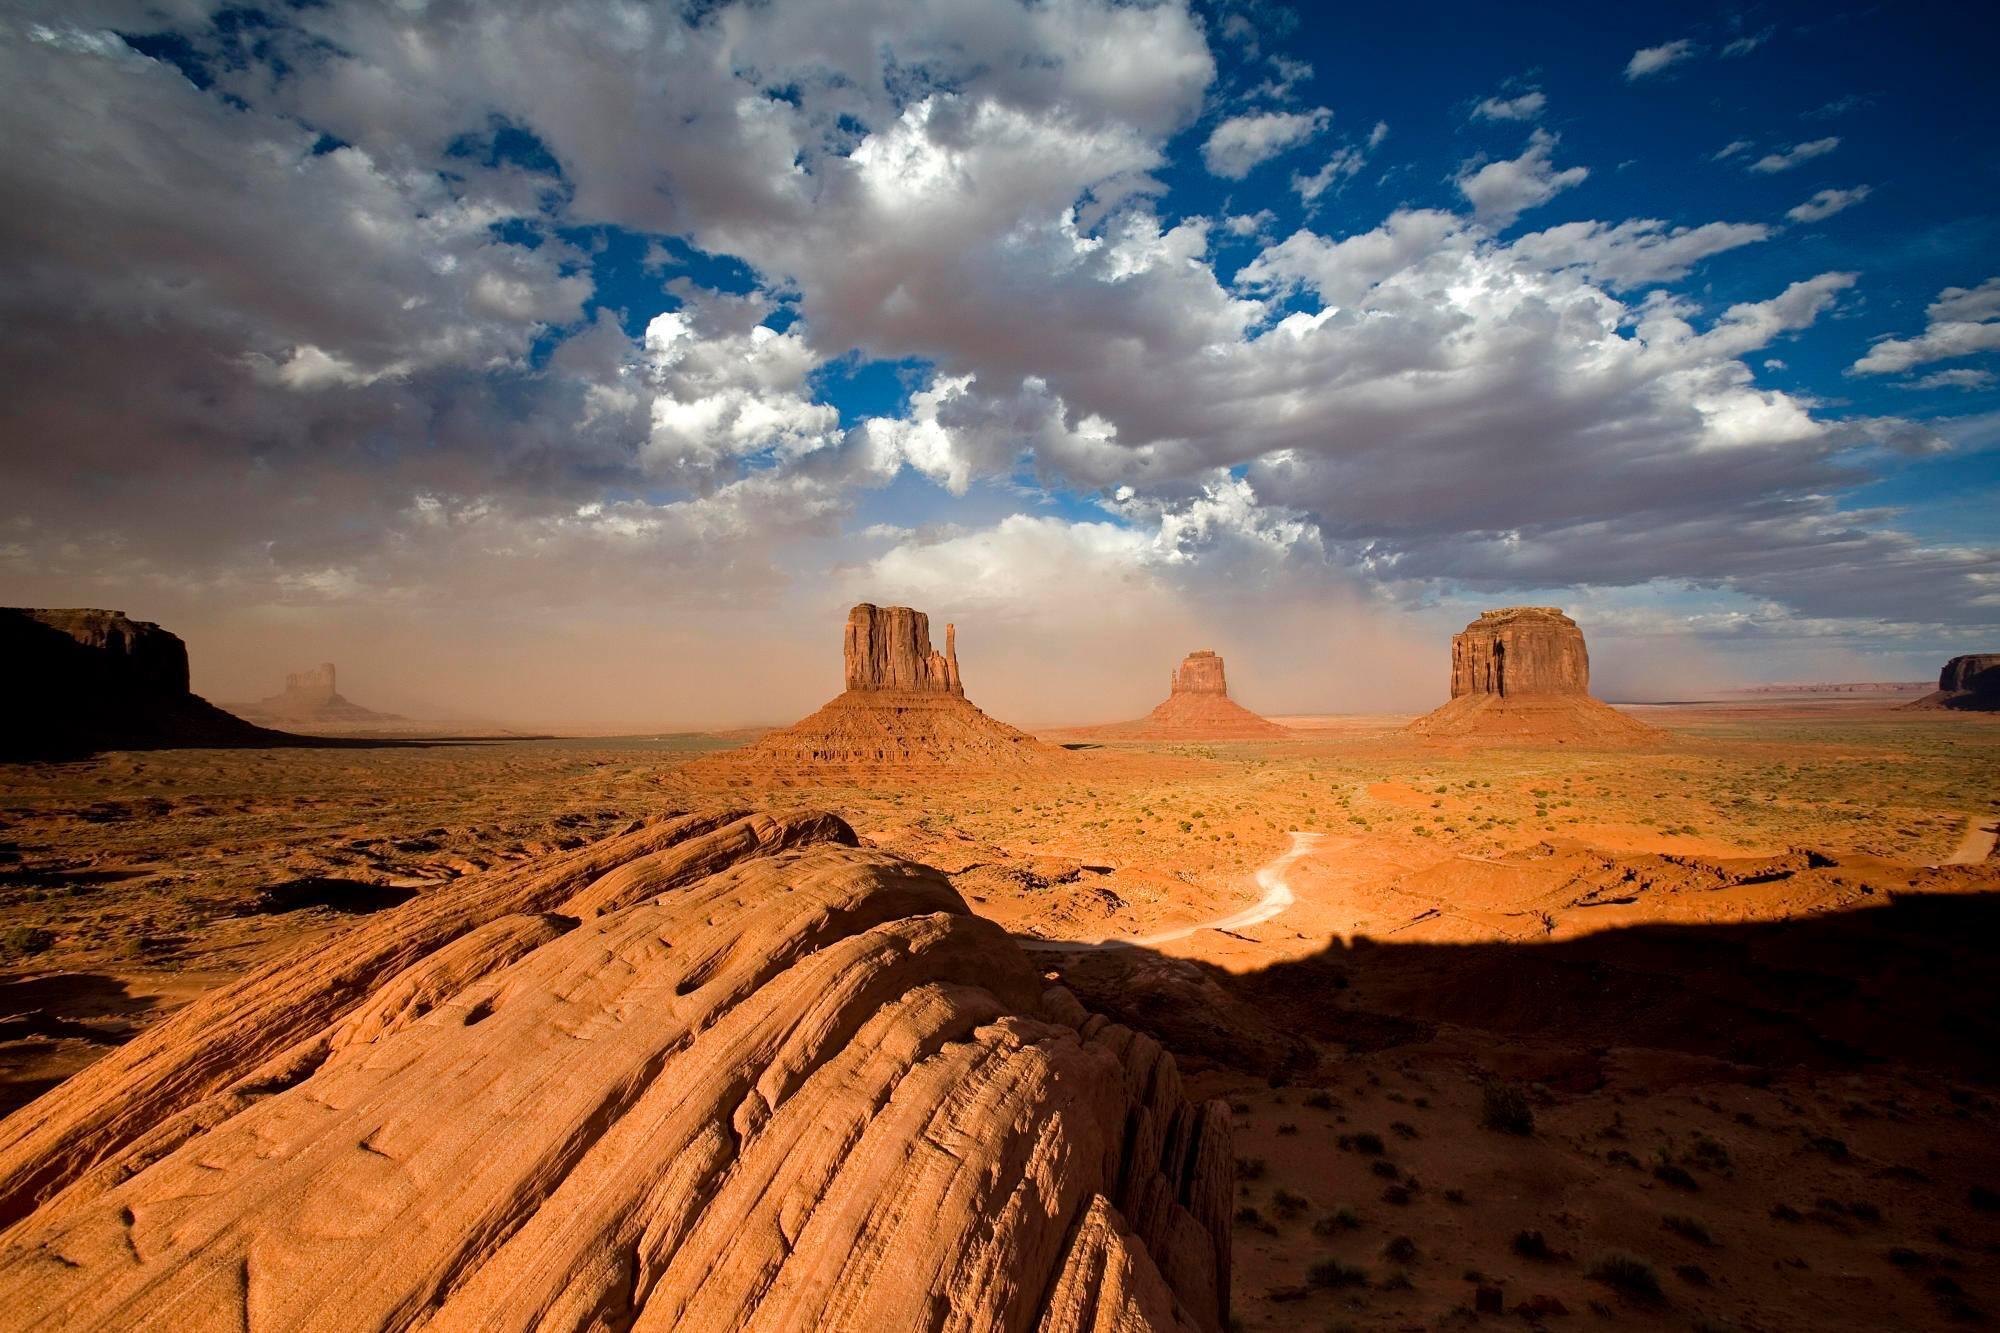 Monument Valley, Utah @Nourlandcom  http://t.co/1qQojnws62